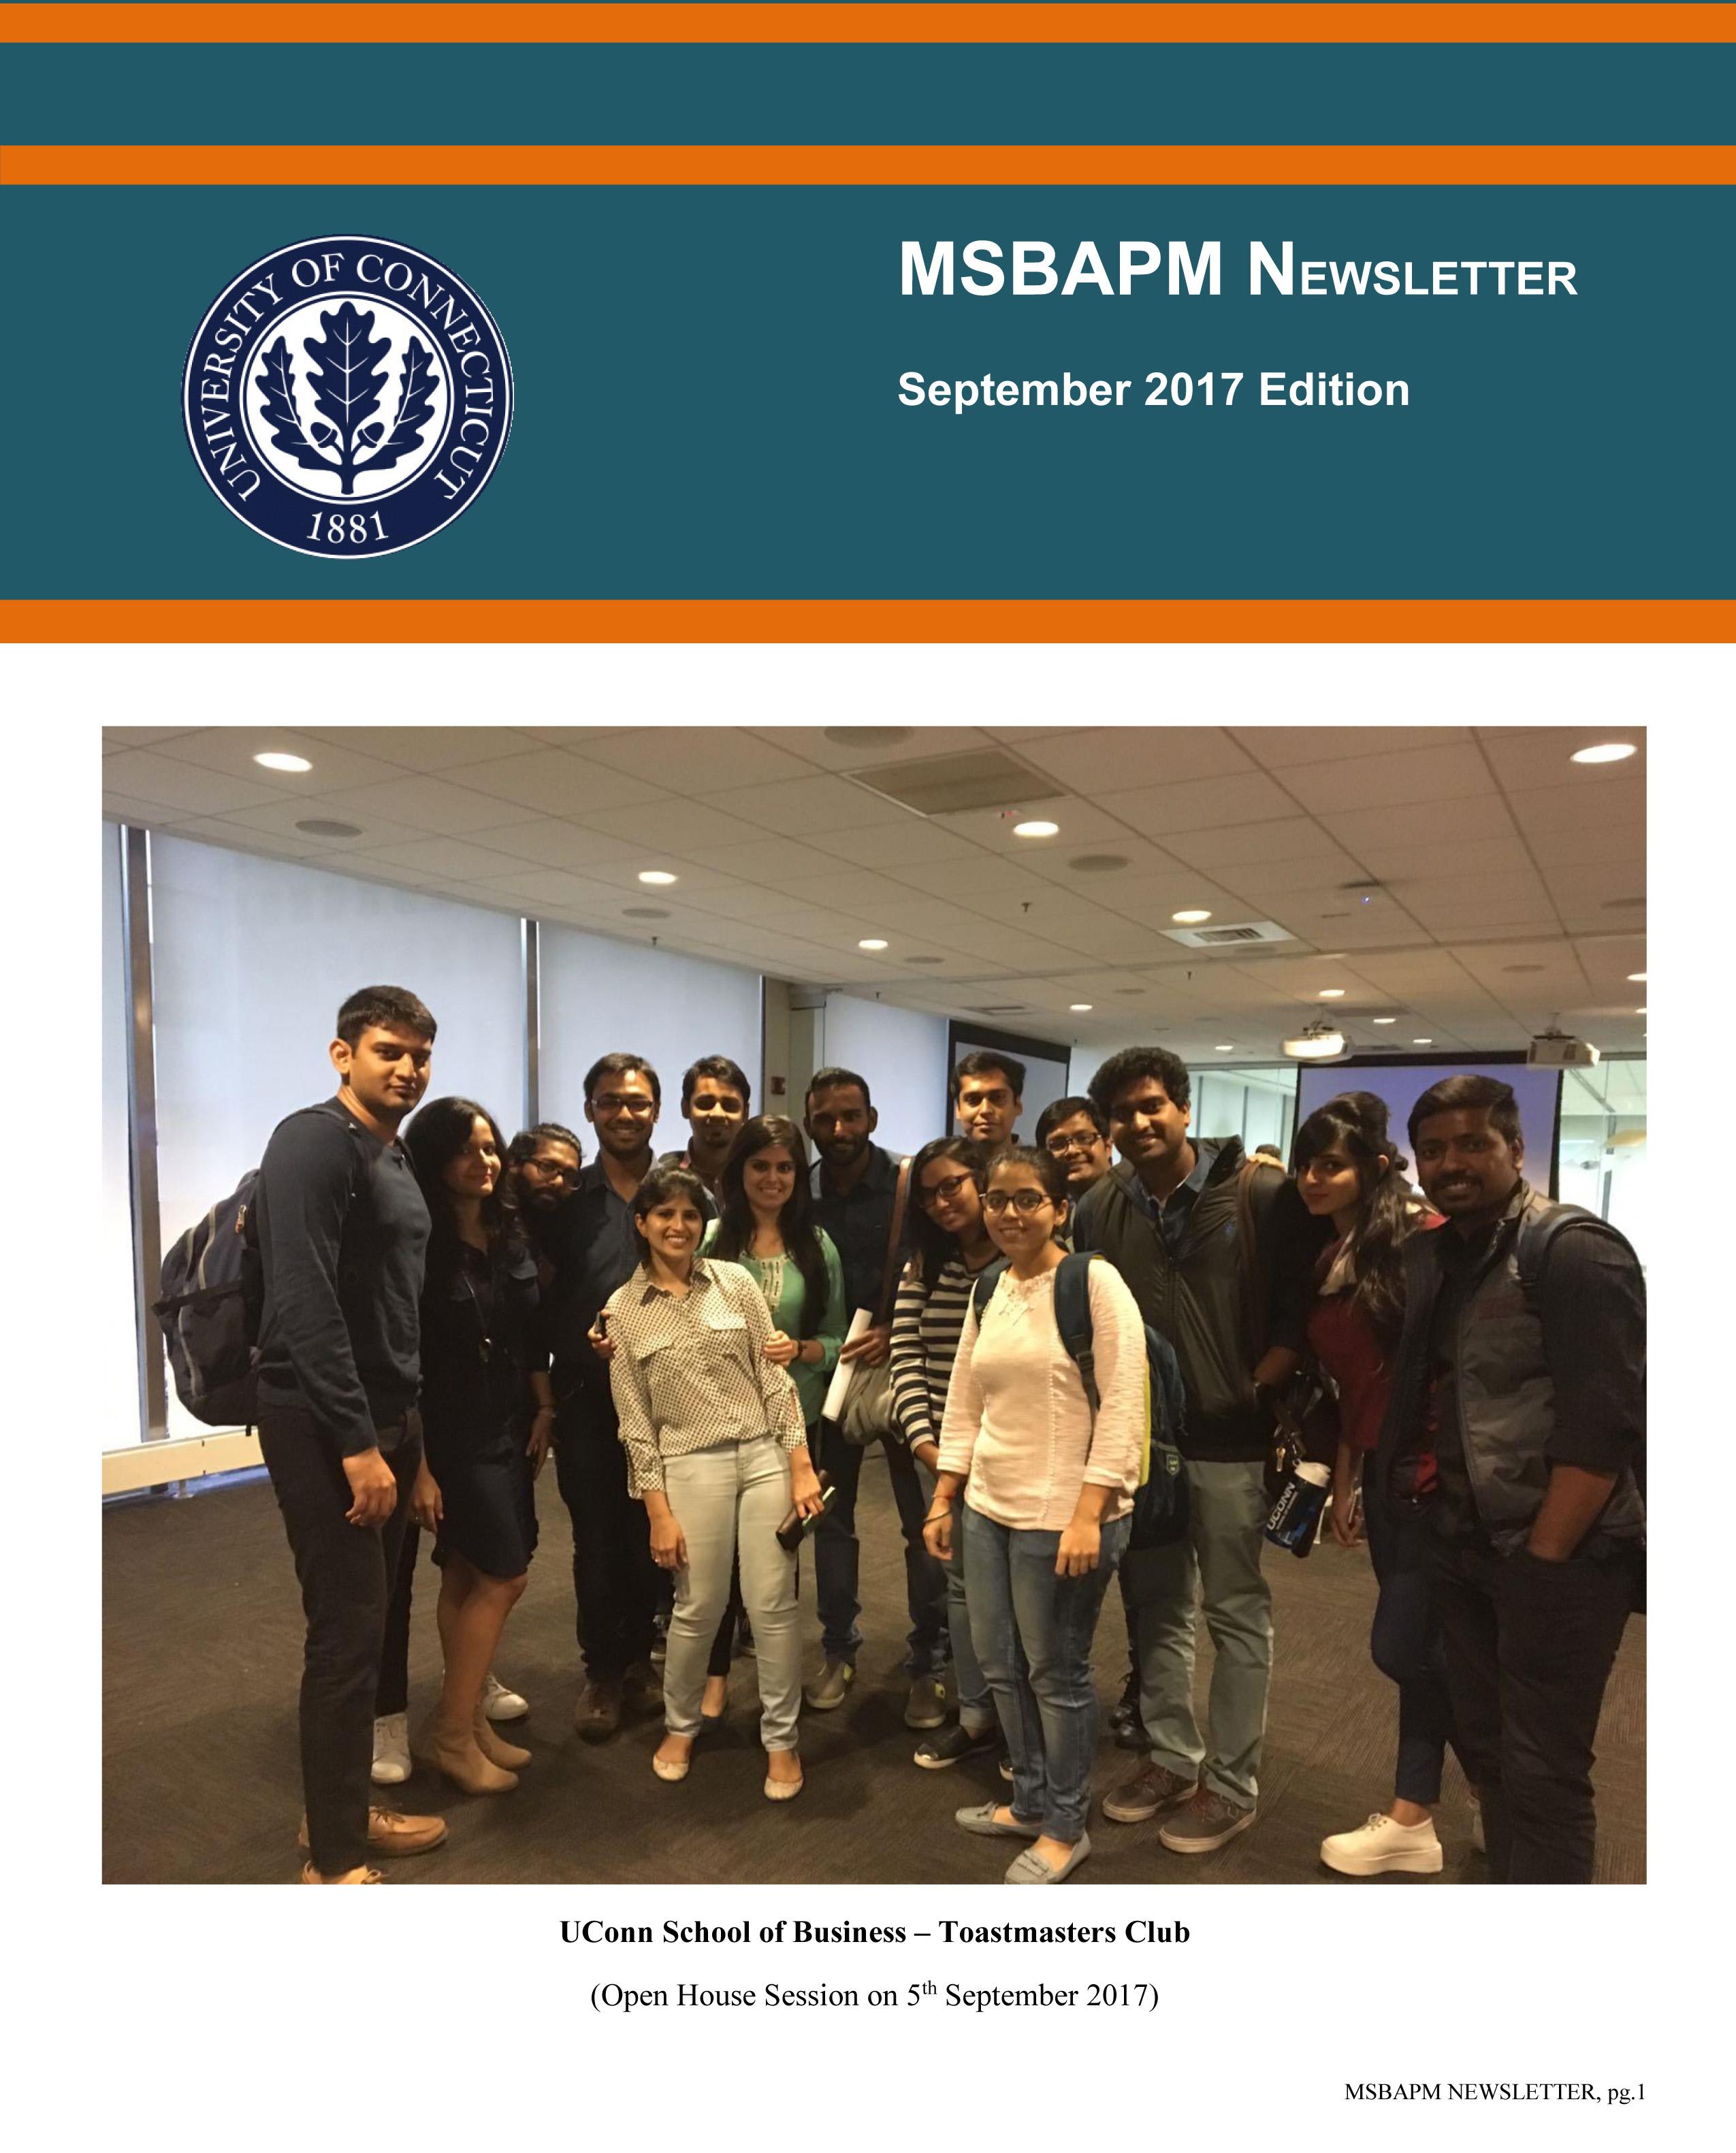 MSBAPM August 2017 Newsletter